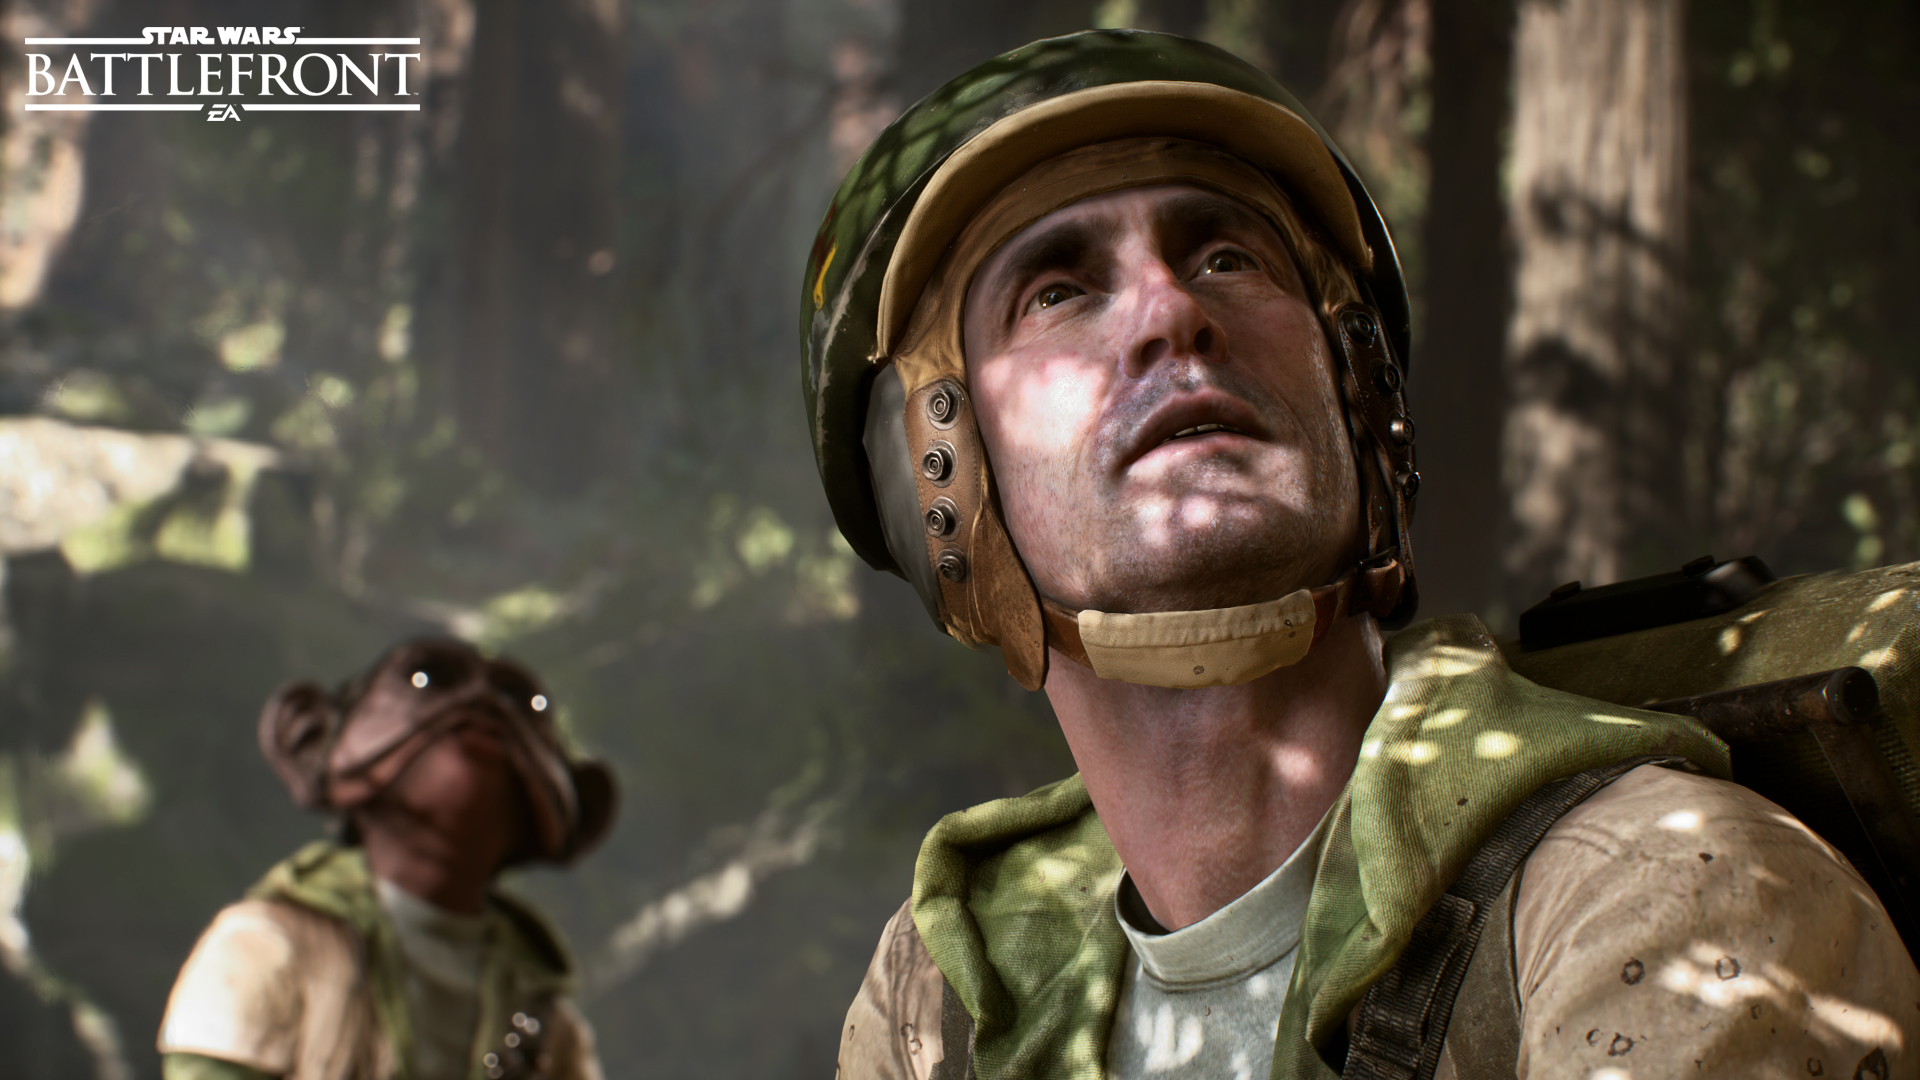 XBOX ONE EA STAR WARS BATTLEFRONT ÖN SİPARİŞ